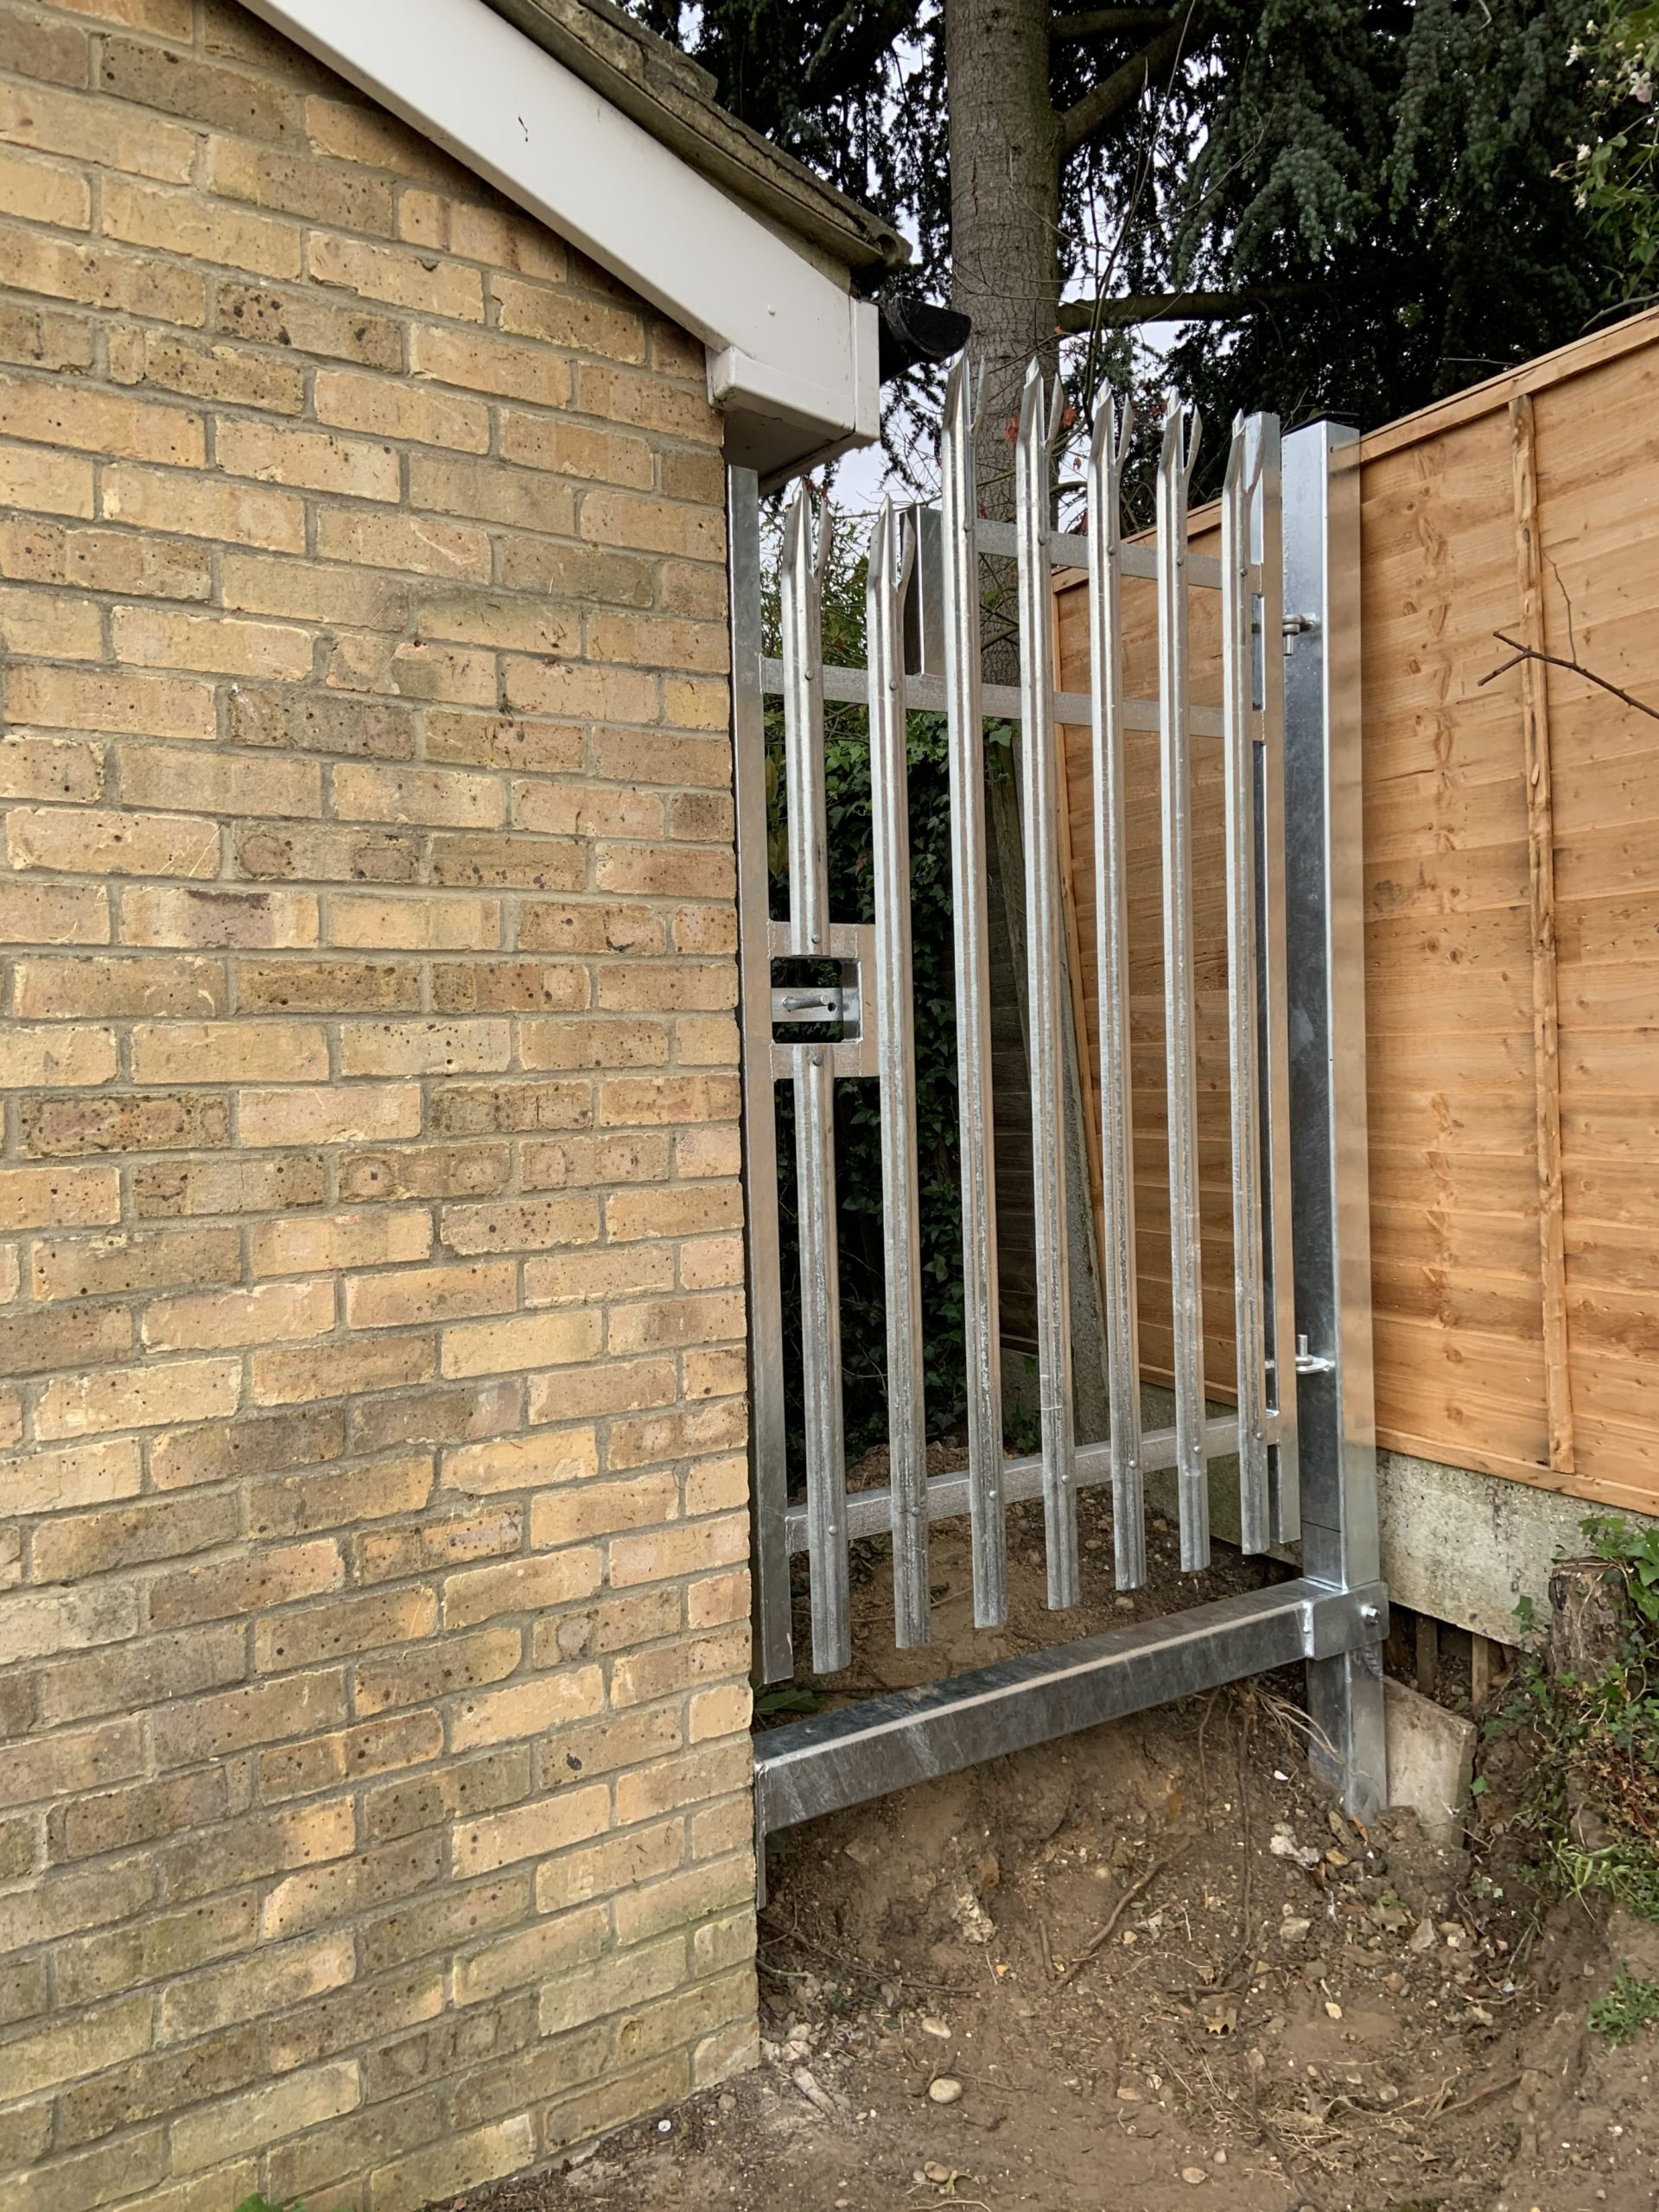 Palisade, Gate, Fabricated, Bespoke, Galvanised, Installation, Security